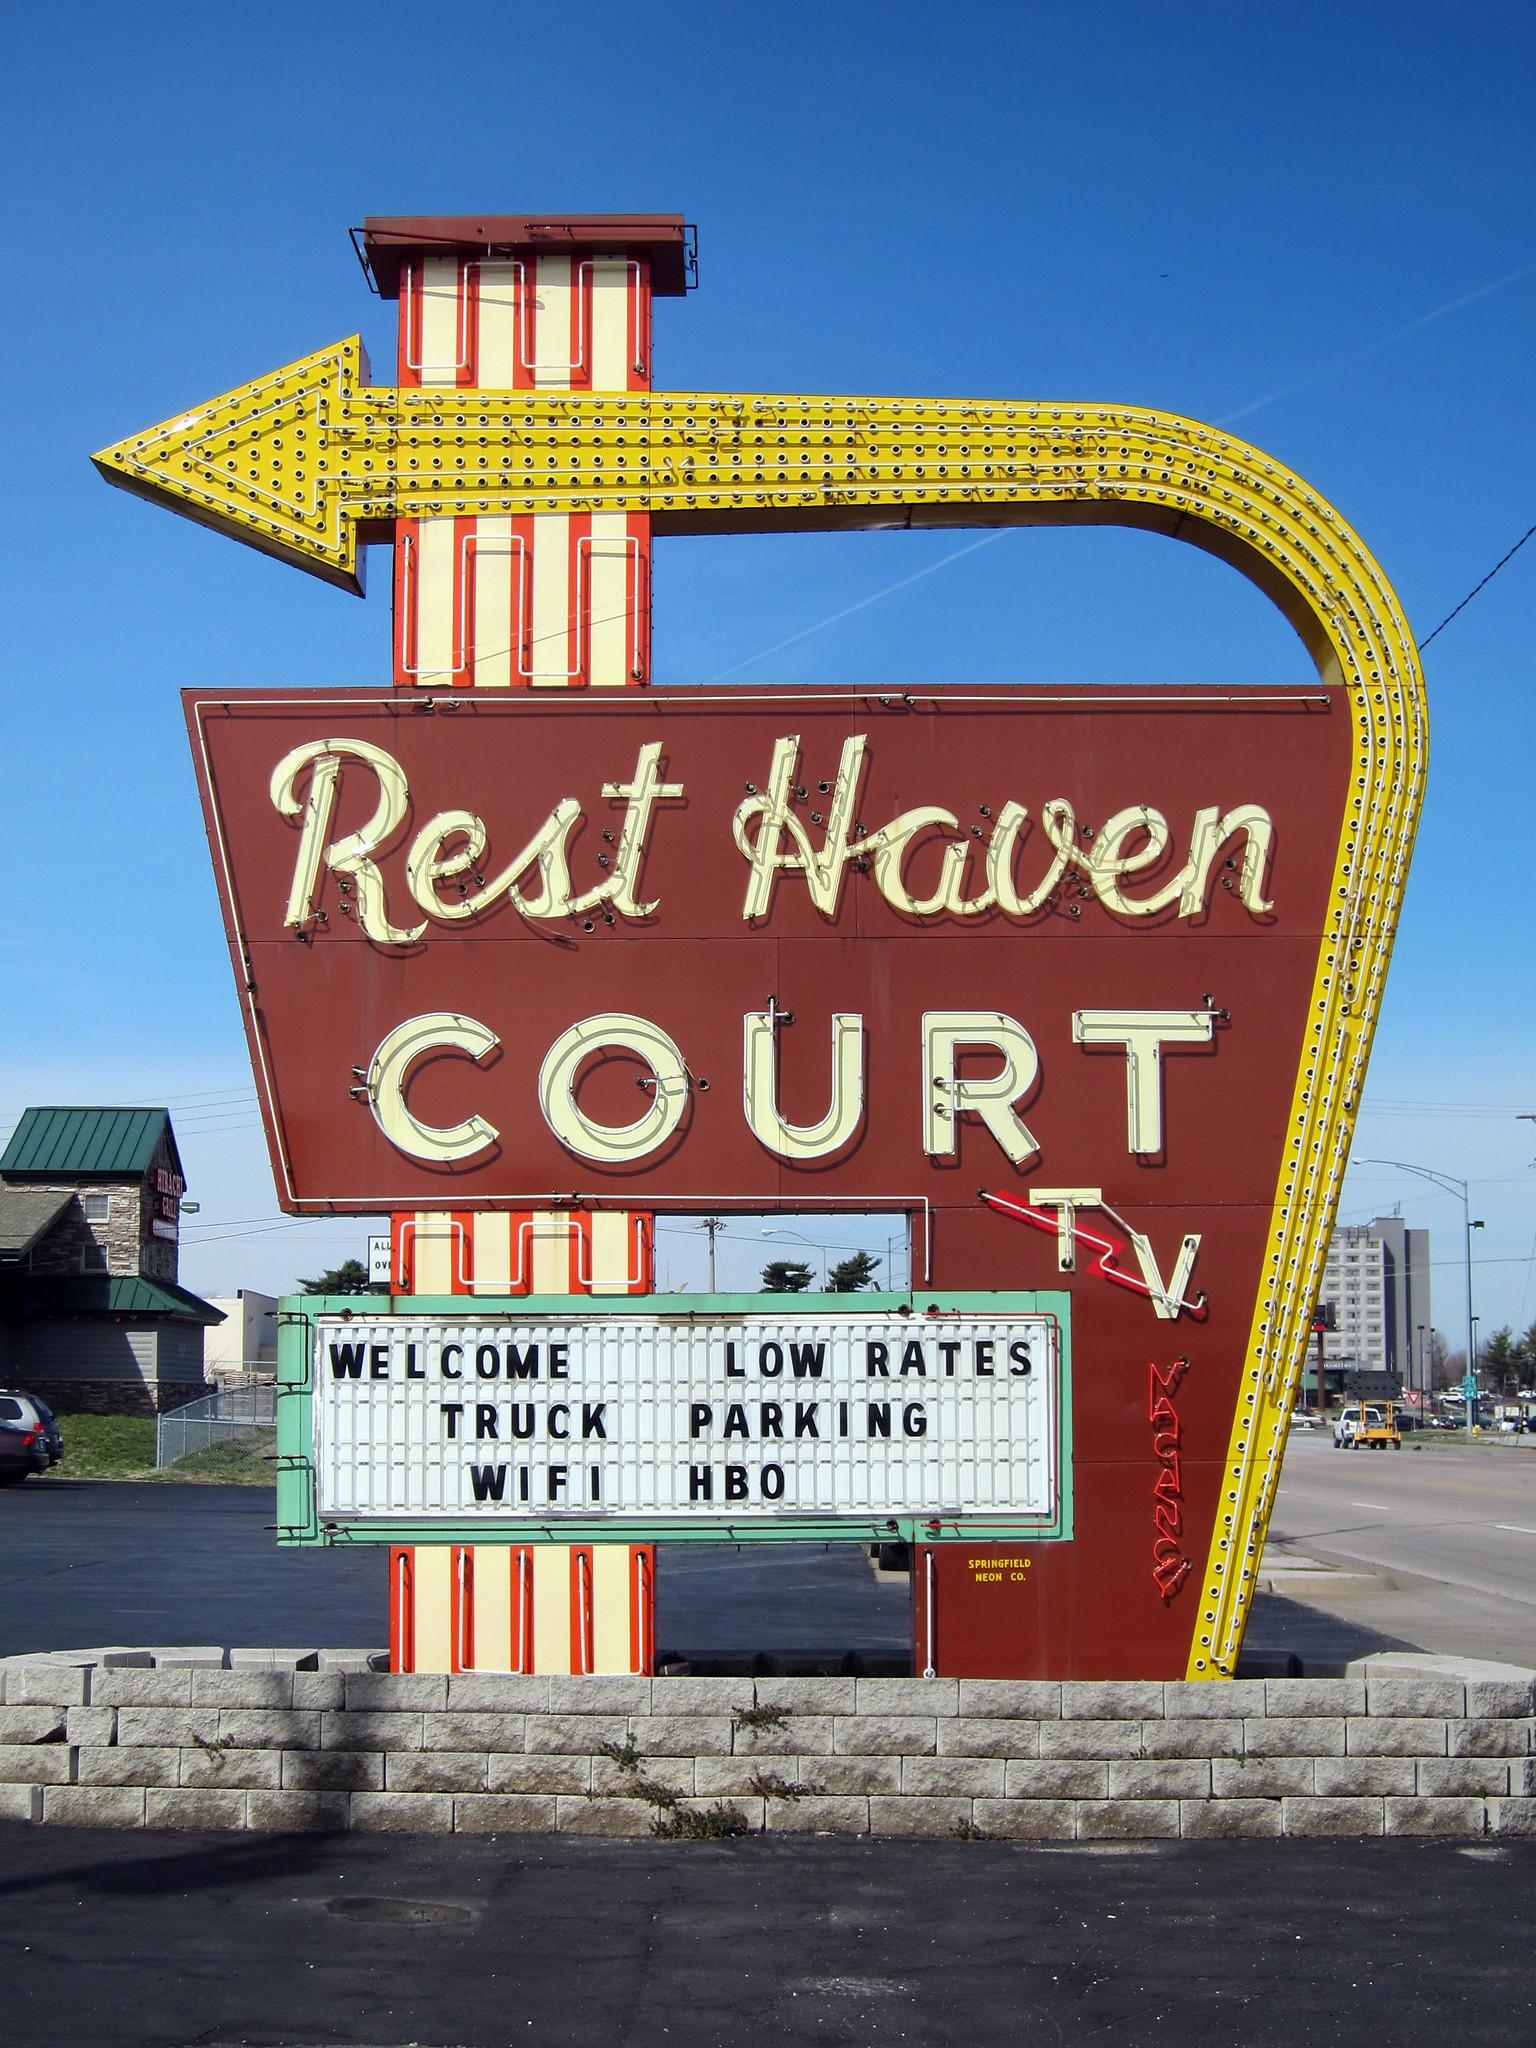 Rest Haven Court - 2000 East Kearney Street, Springfield, Missouri U.S.A. - April 3, 2013